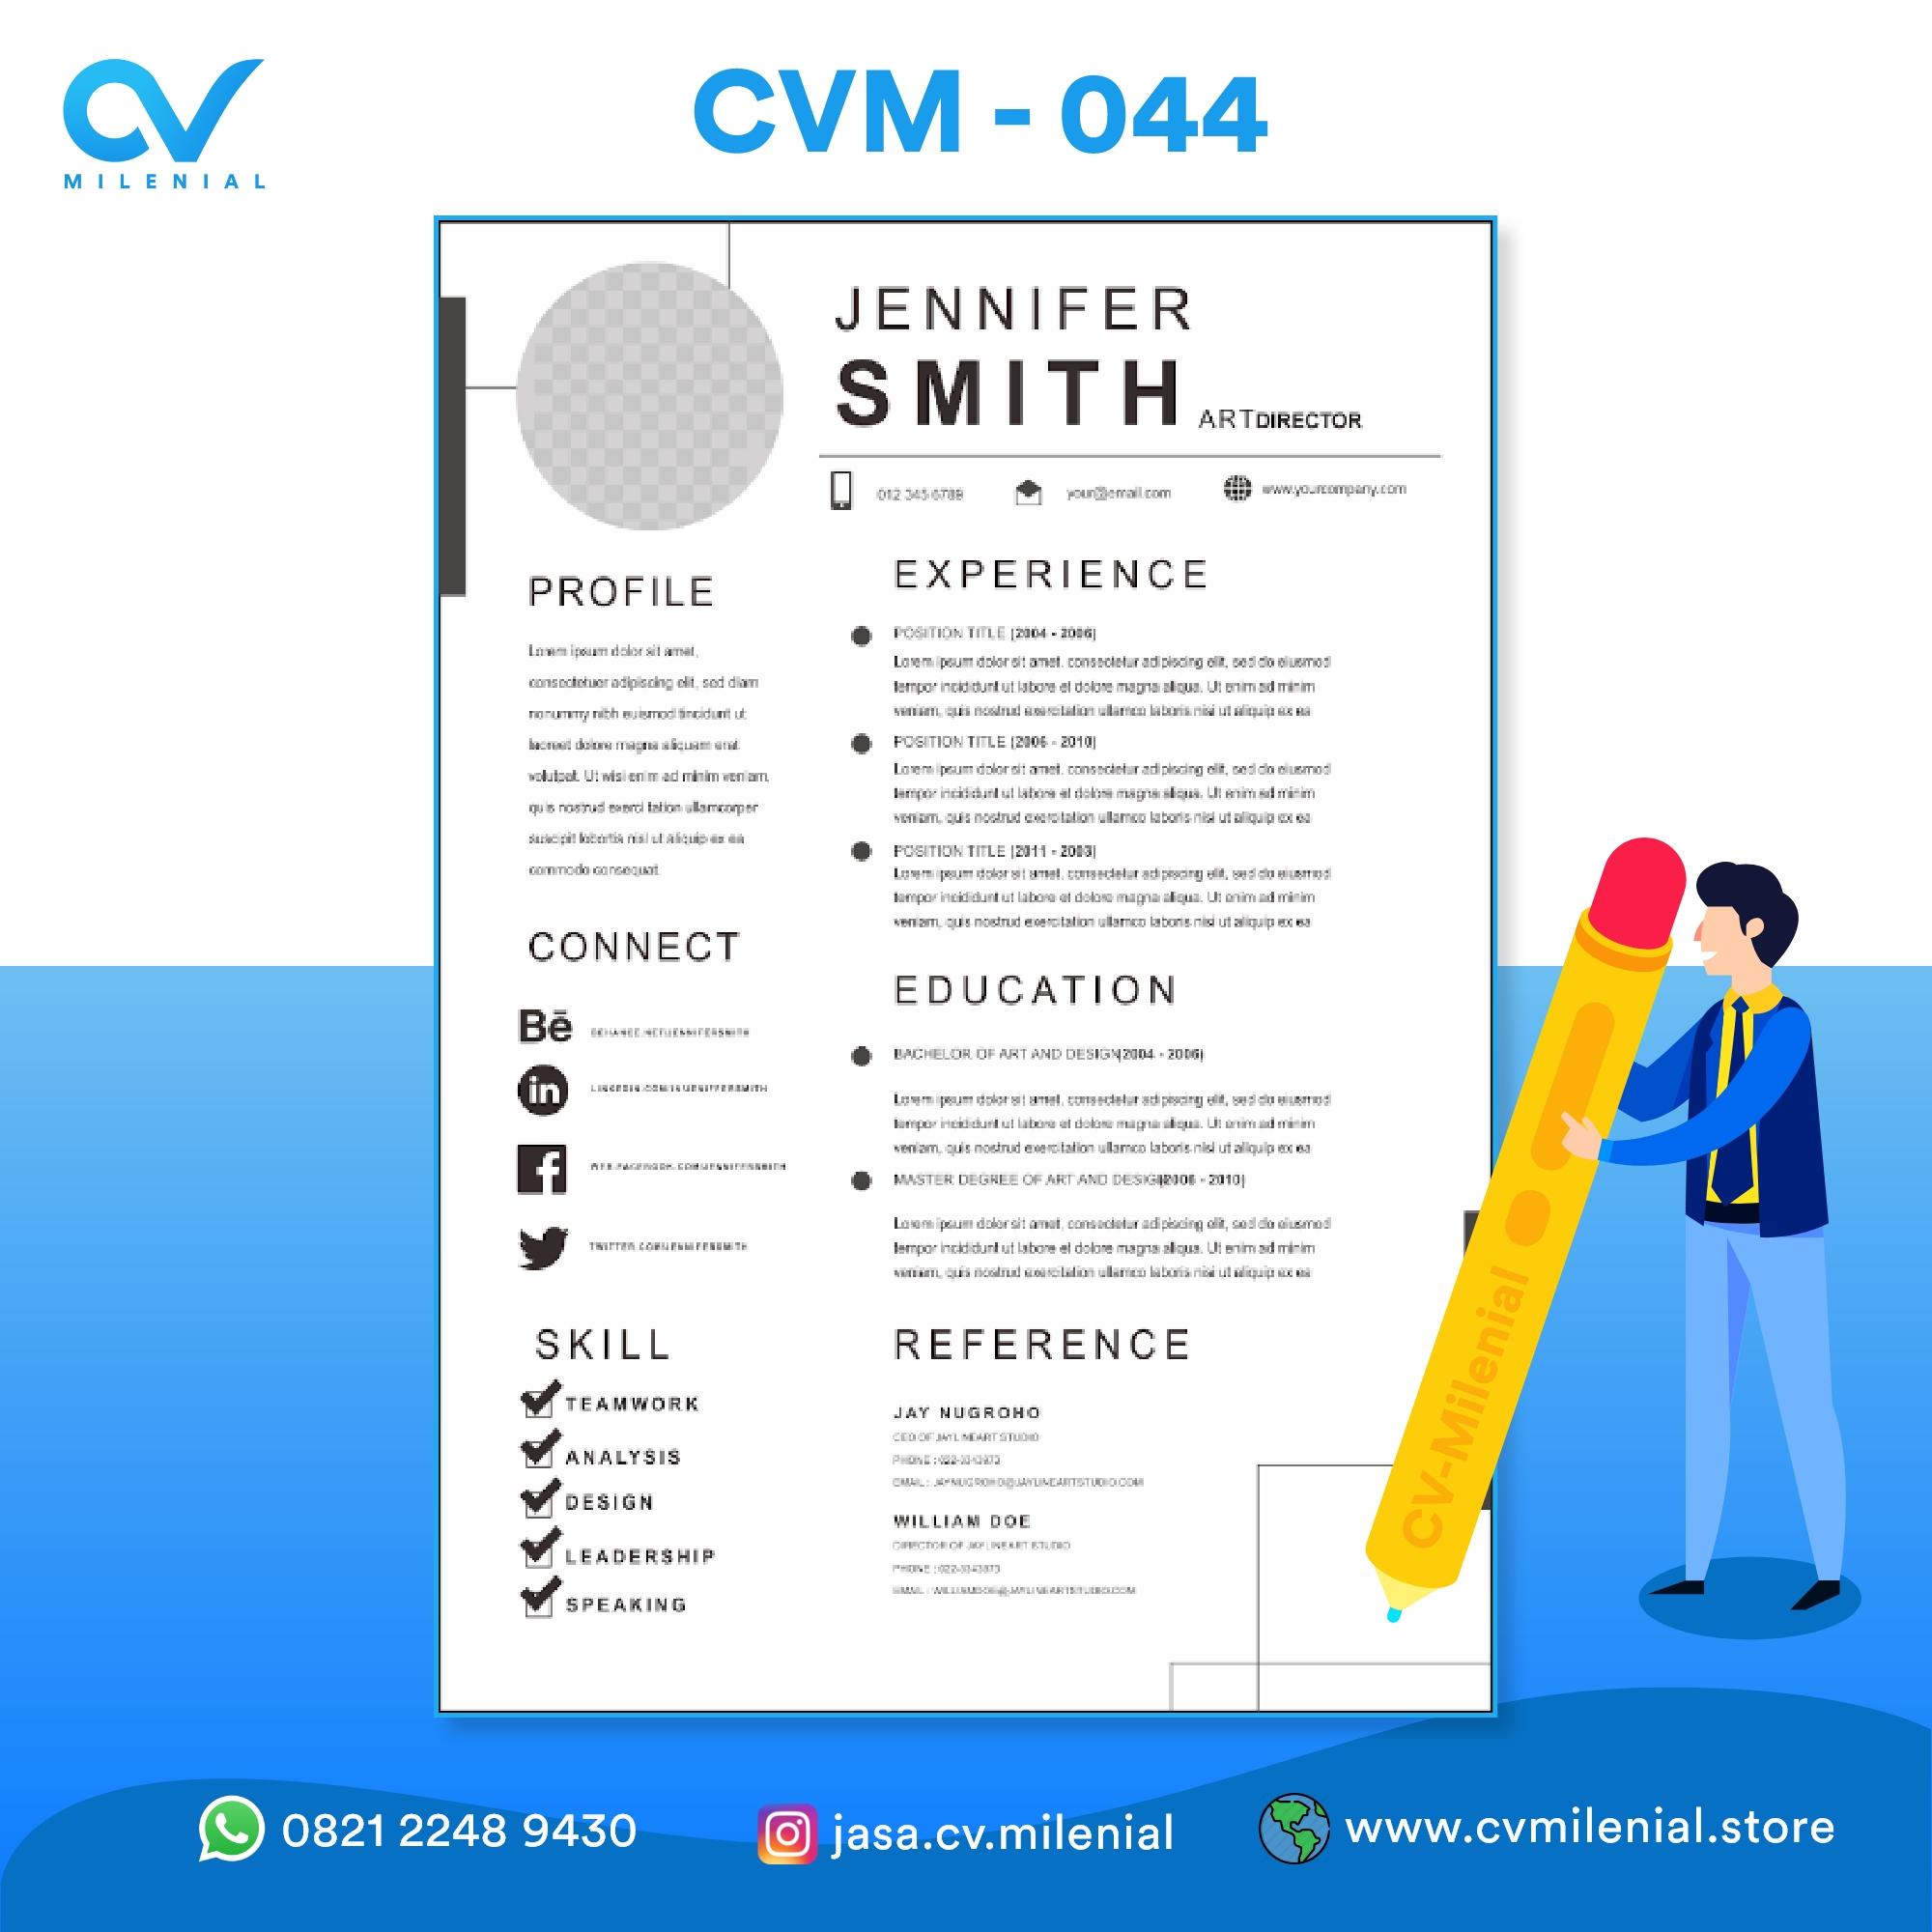 https://cvmilenial.com/assets/image/desain_cv/44.jpg